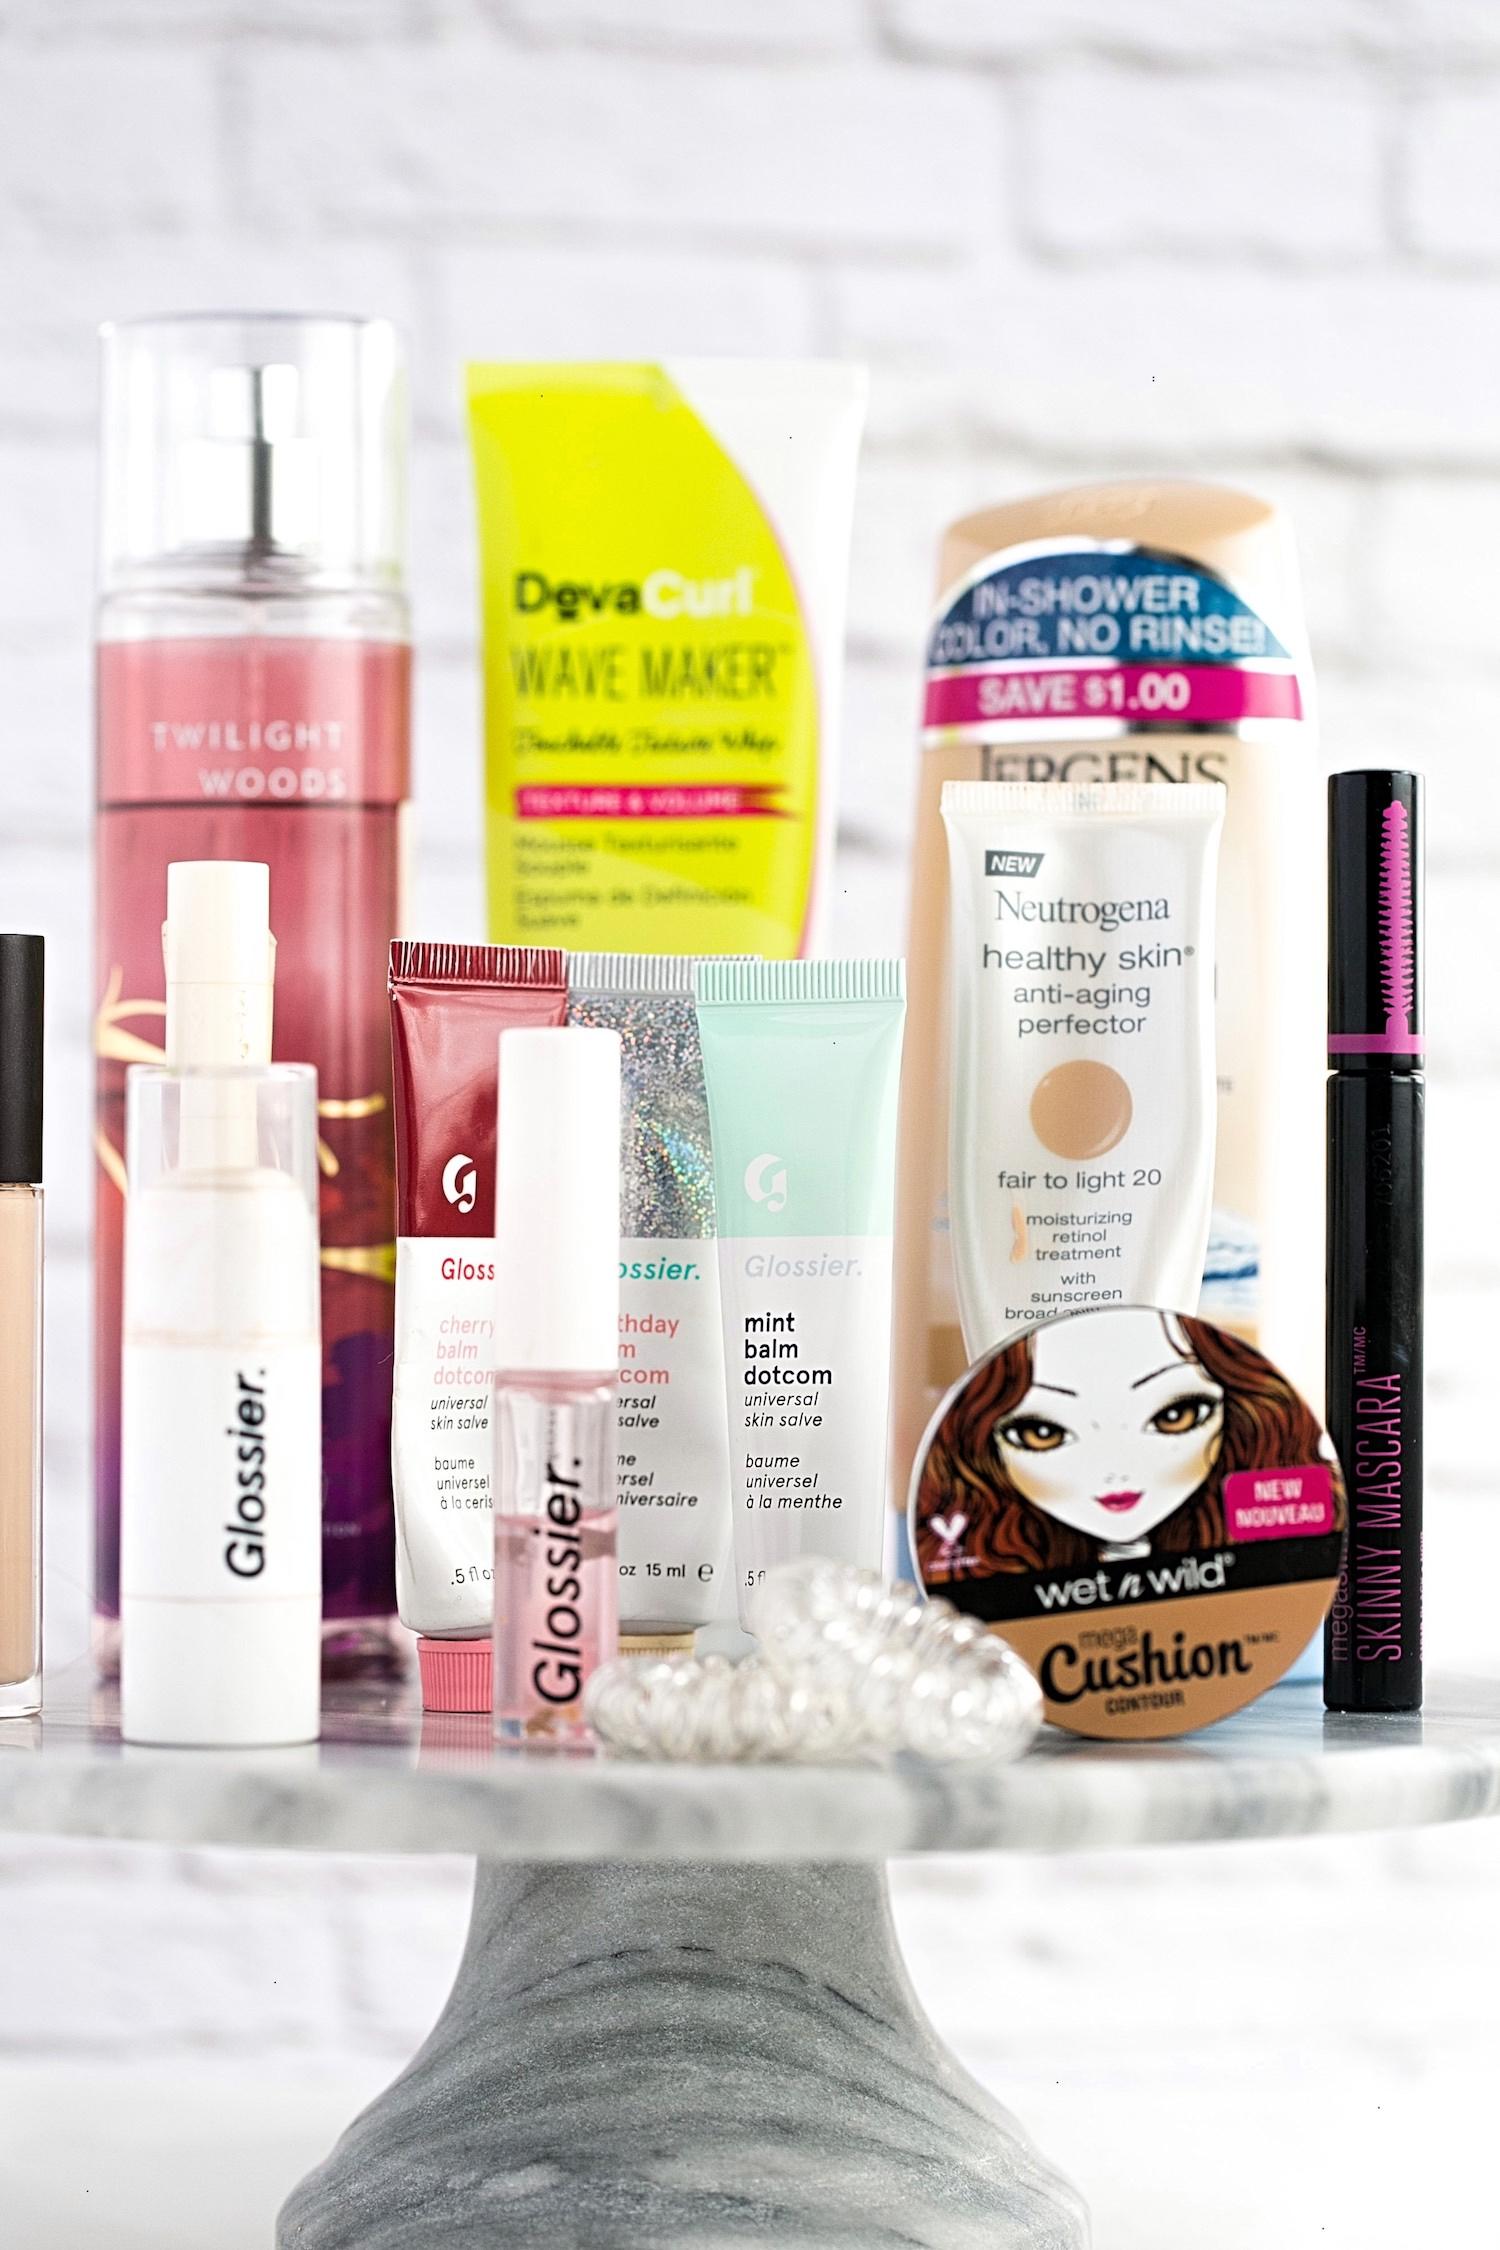 New Favorite Beauty Buys | TrufflesandTrends.com